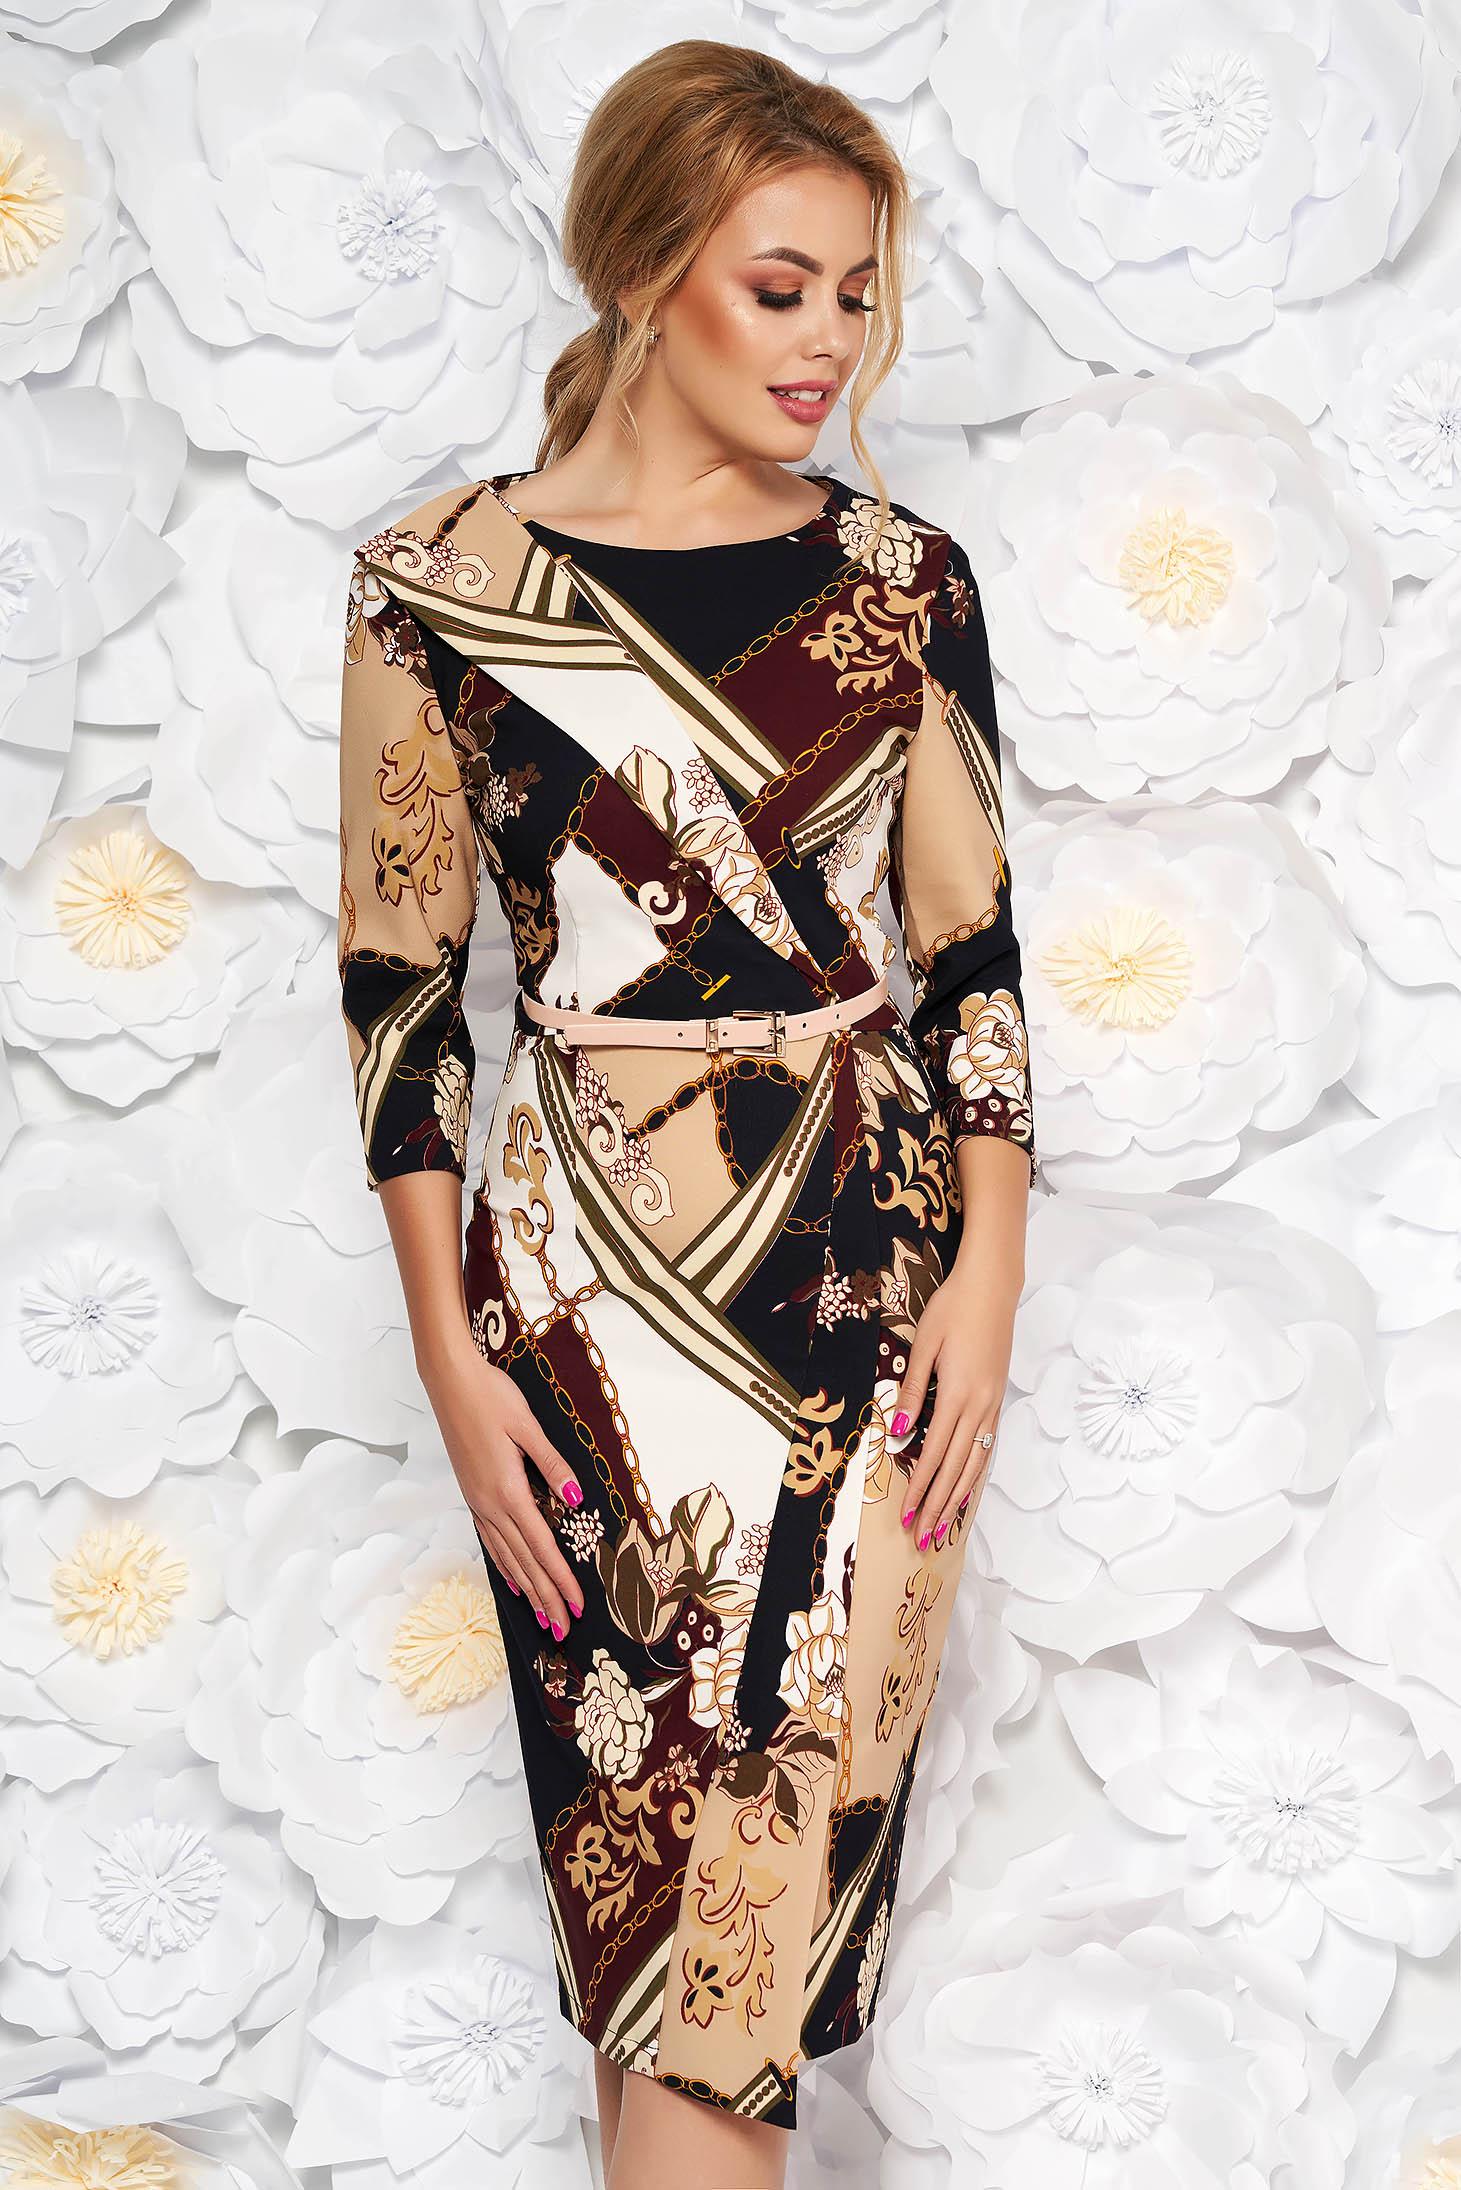 LaDonna cream office pencil dress slightly elastic fabric accessorized with belt